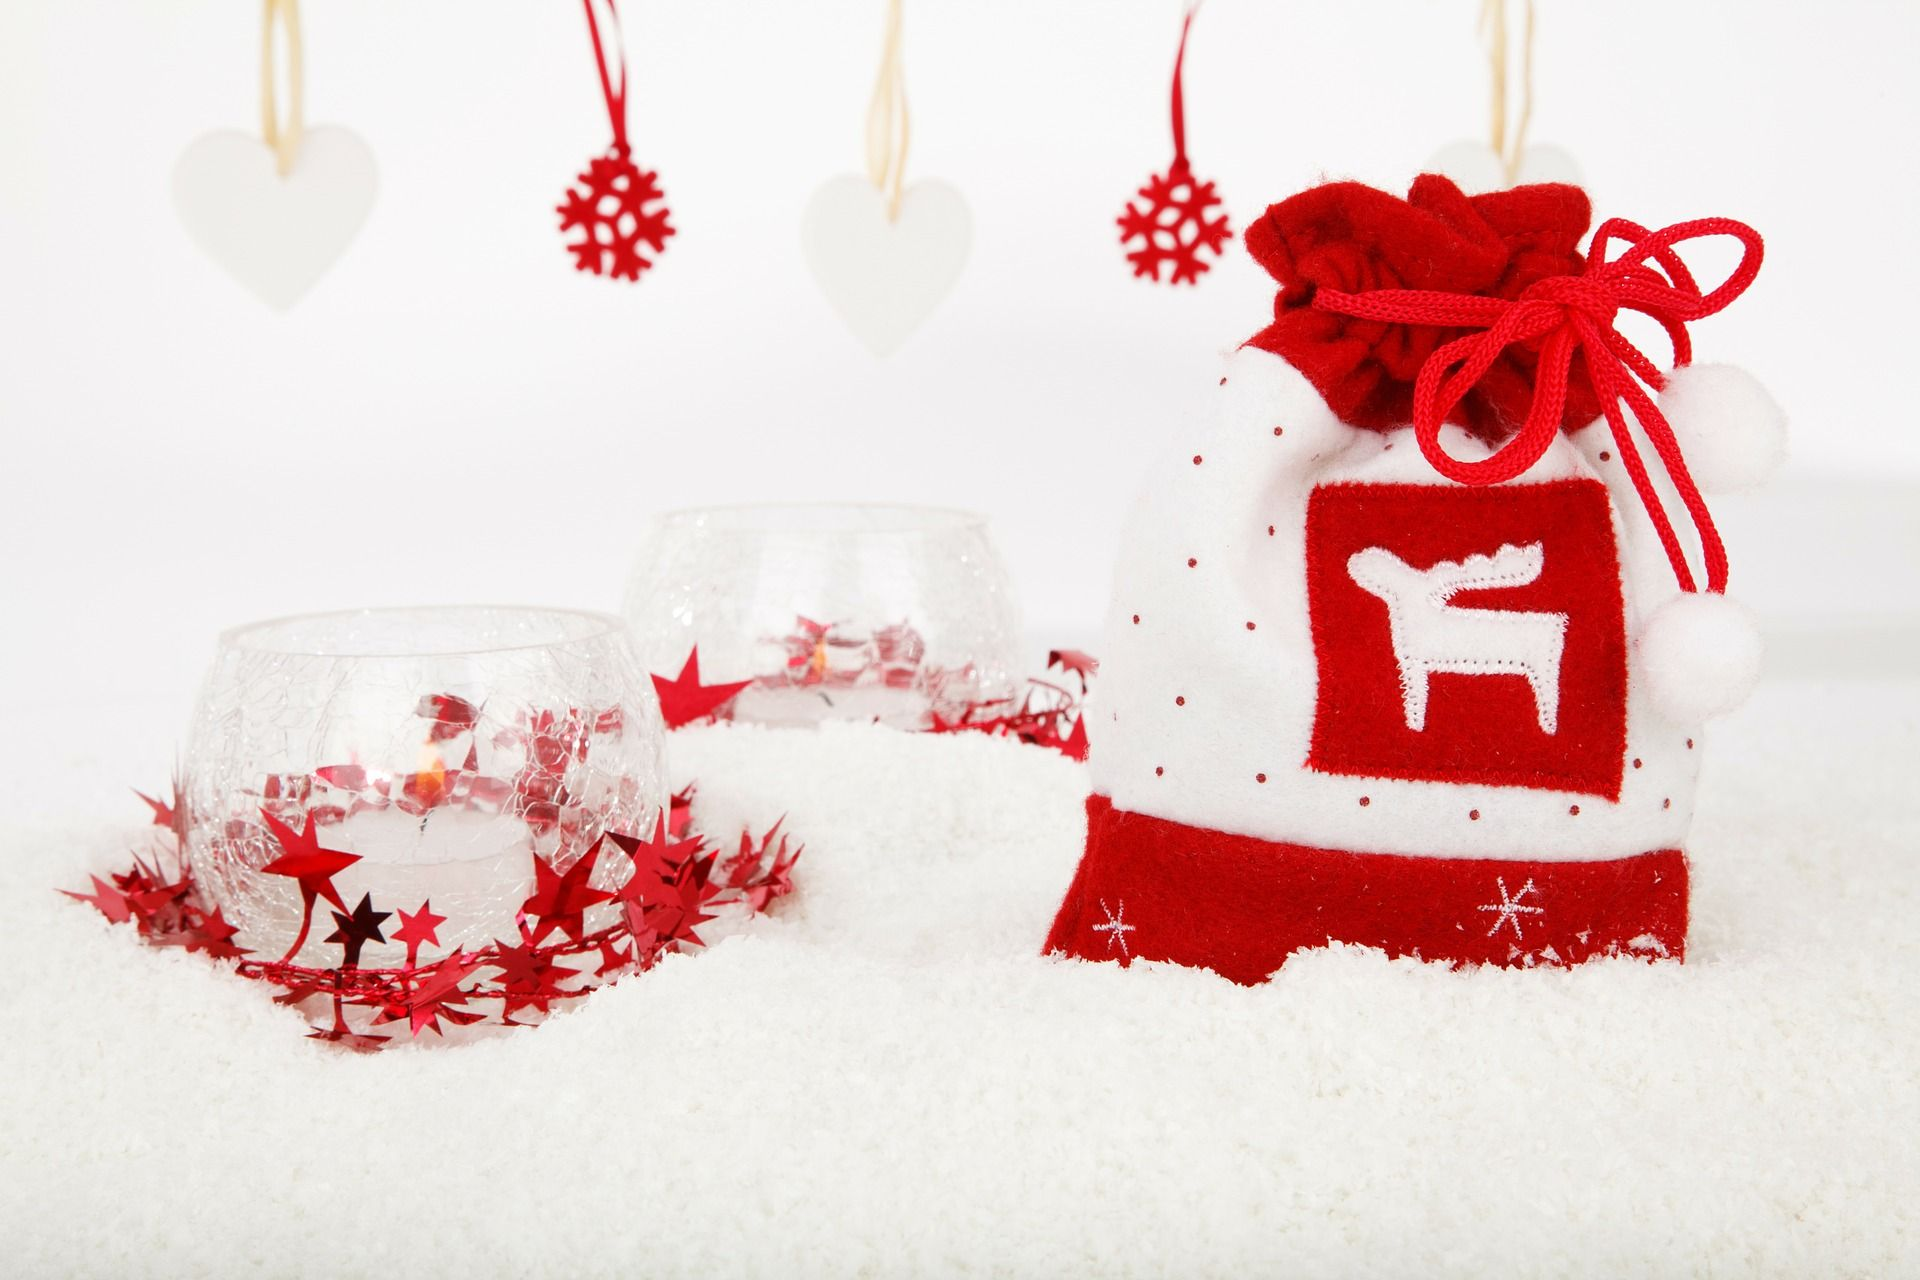 DIY Holiday Gift Giving - craftyminx (the Craft & Hobby blog ...